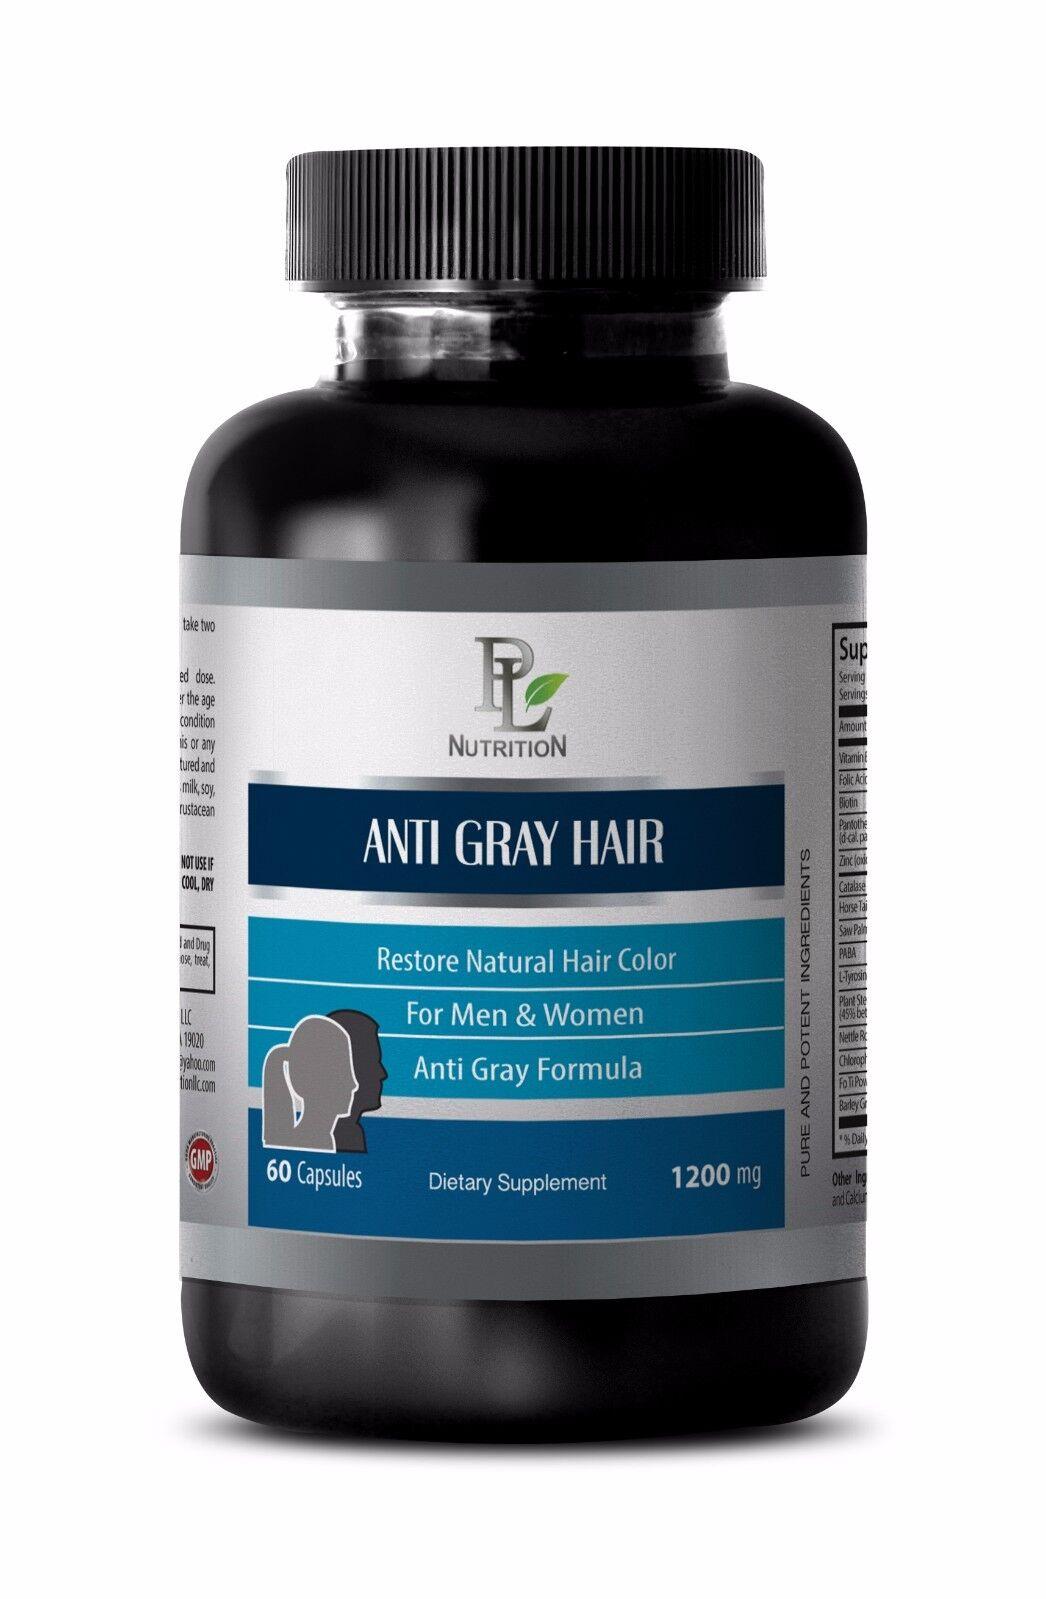 Horsetail Supplement Anti Gray Hair Care Restoring Natural Hair